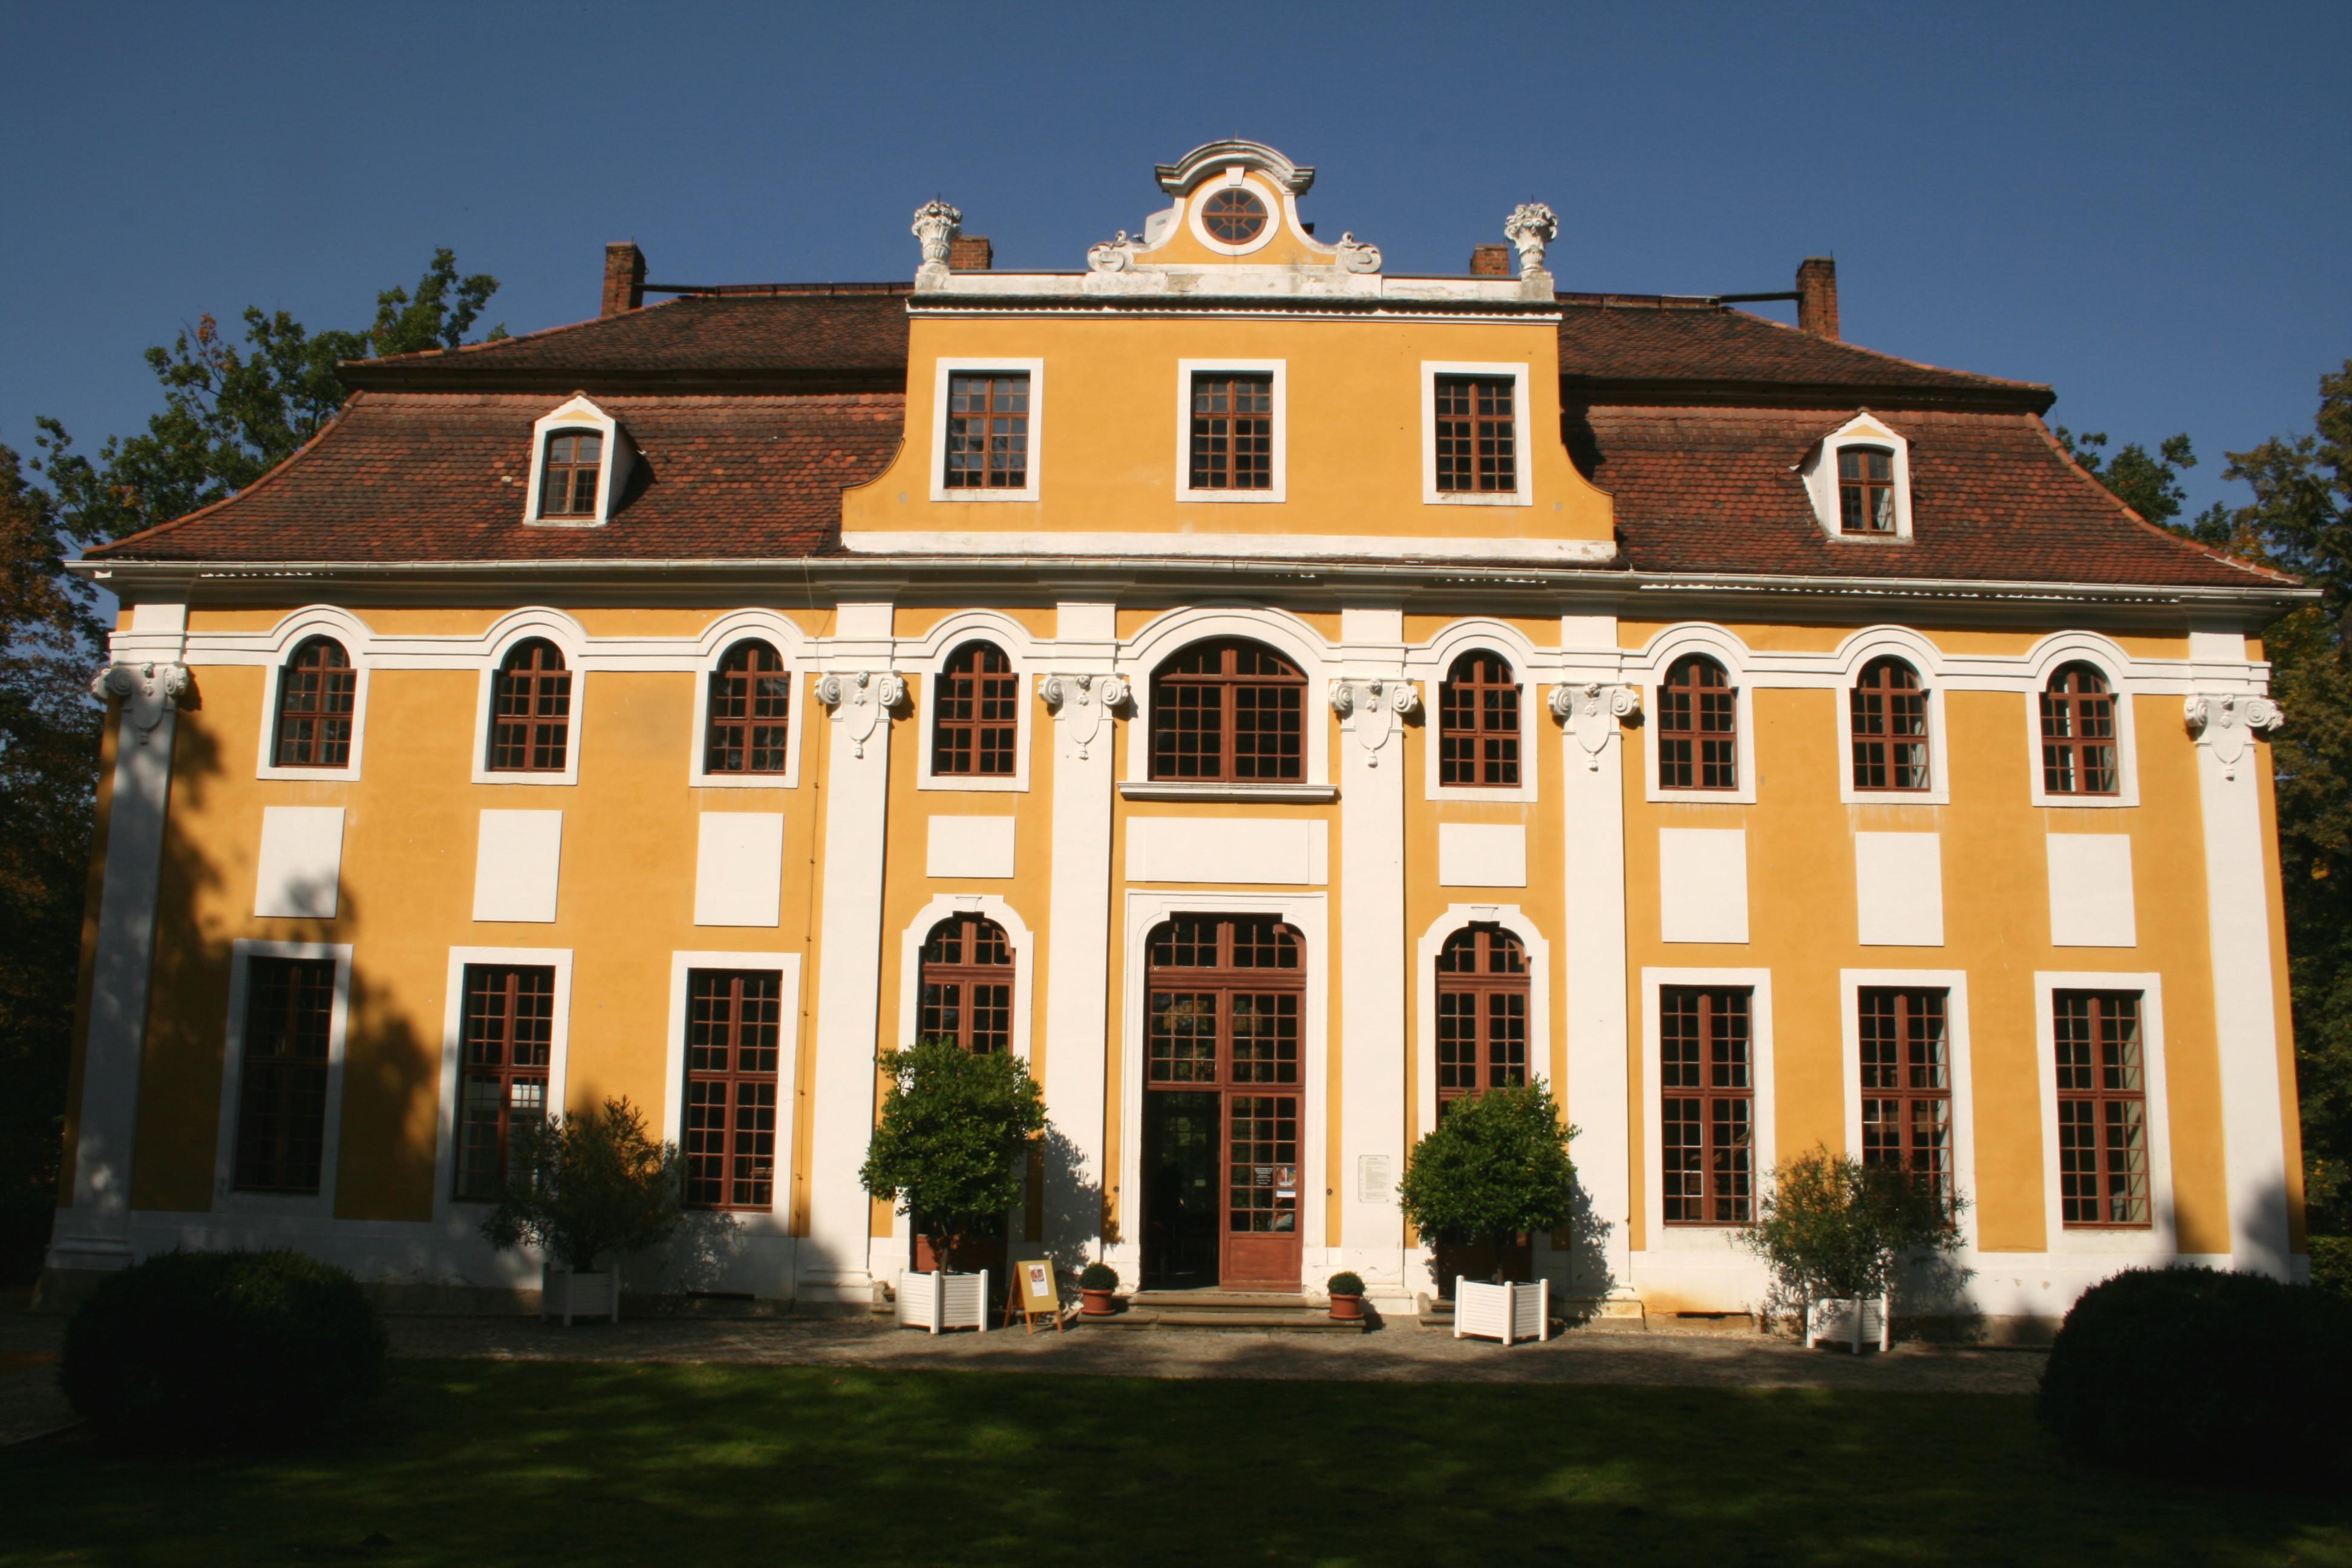 Neschwitz